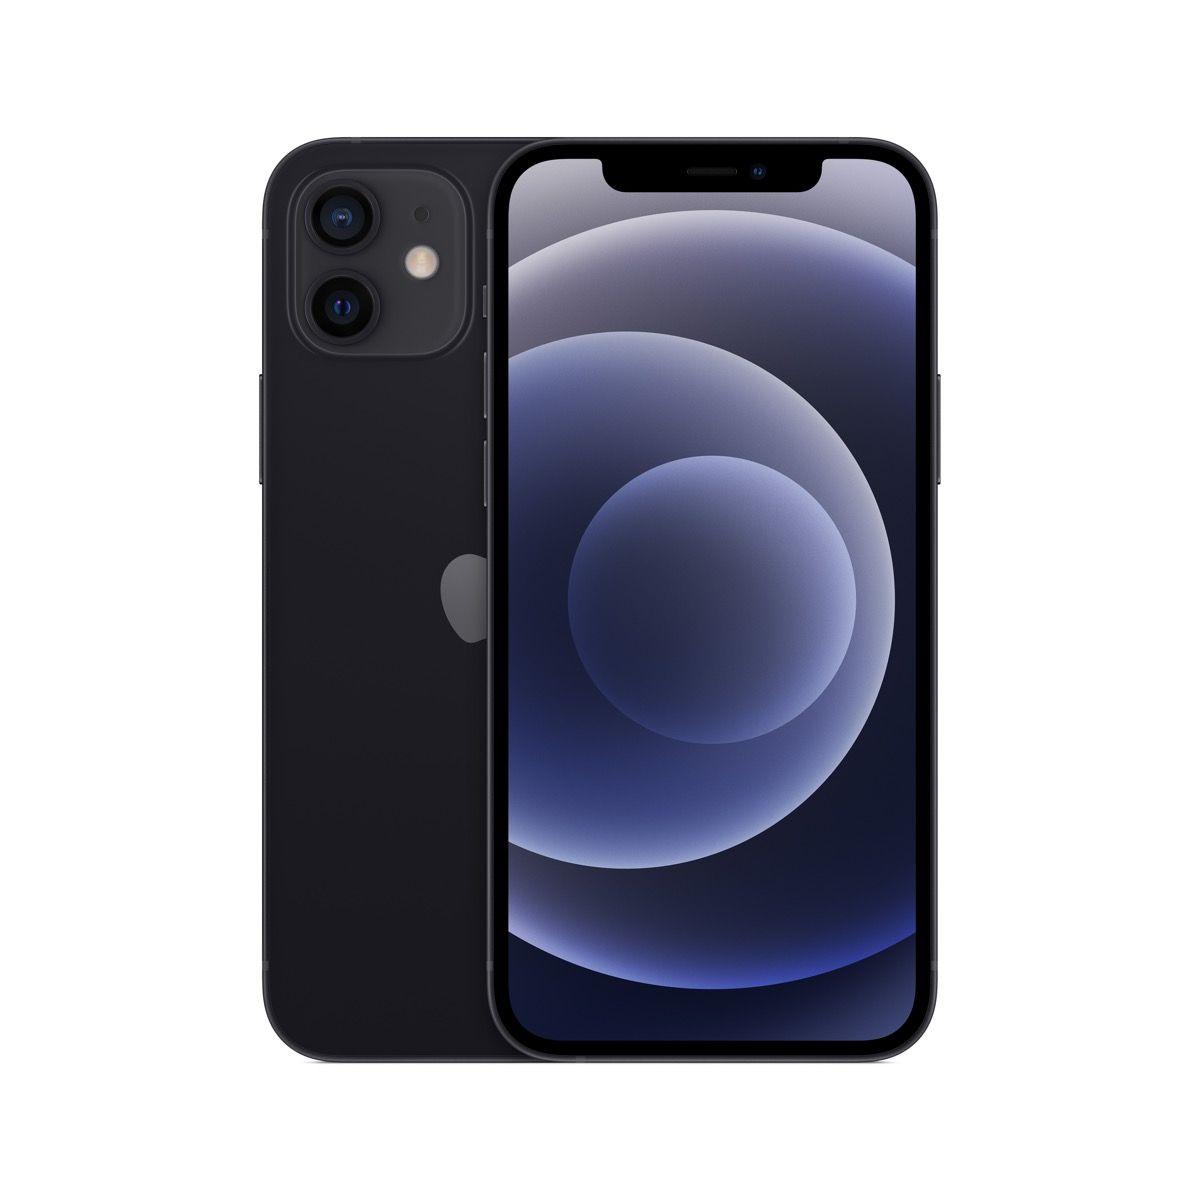 Apple iPhone 12 mini 128GB Black / SK